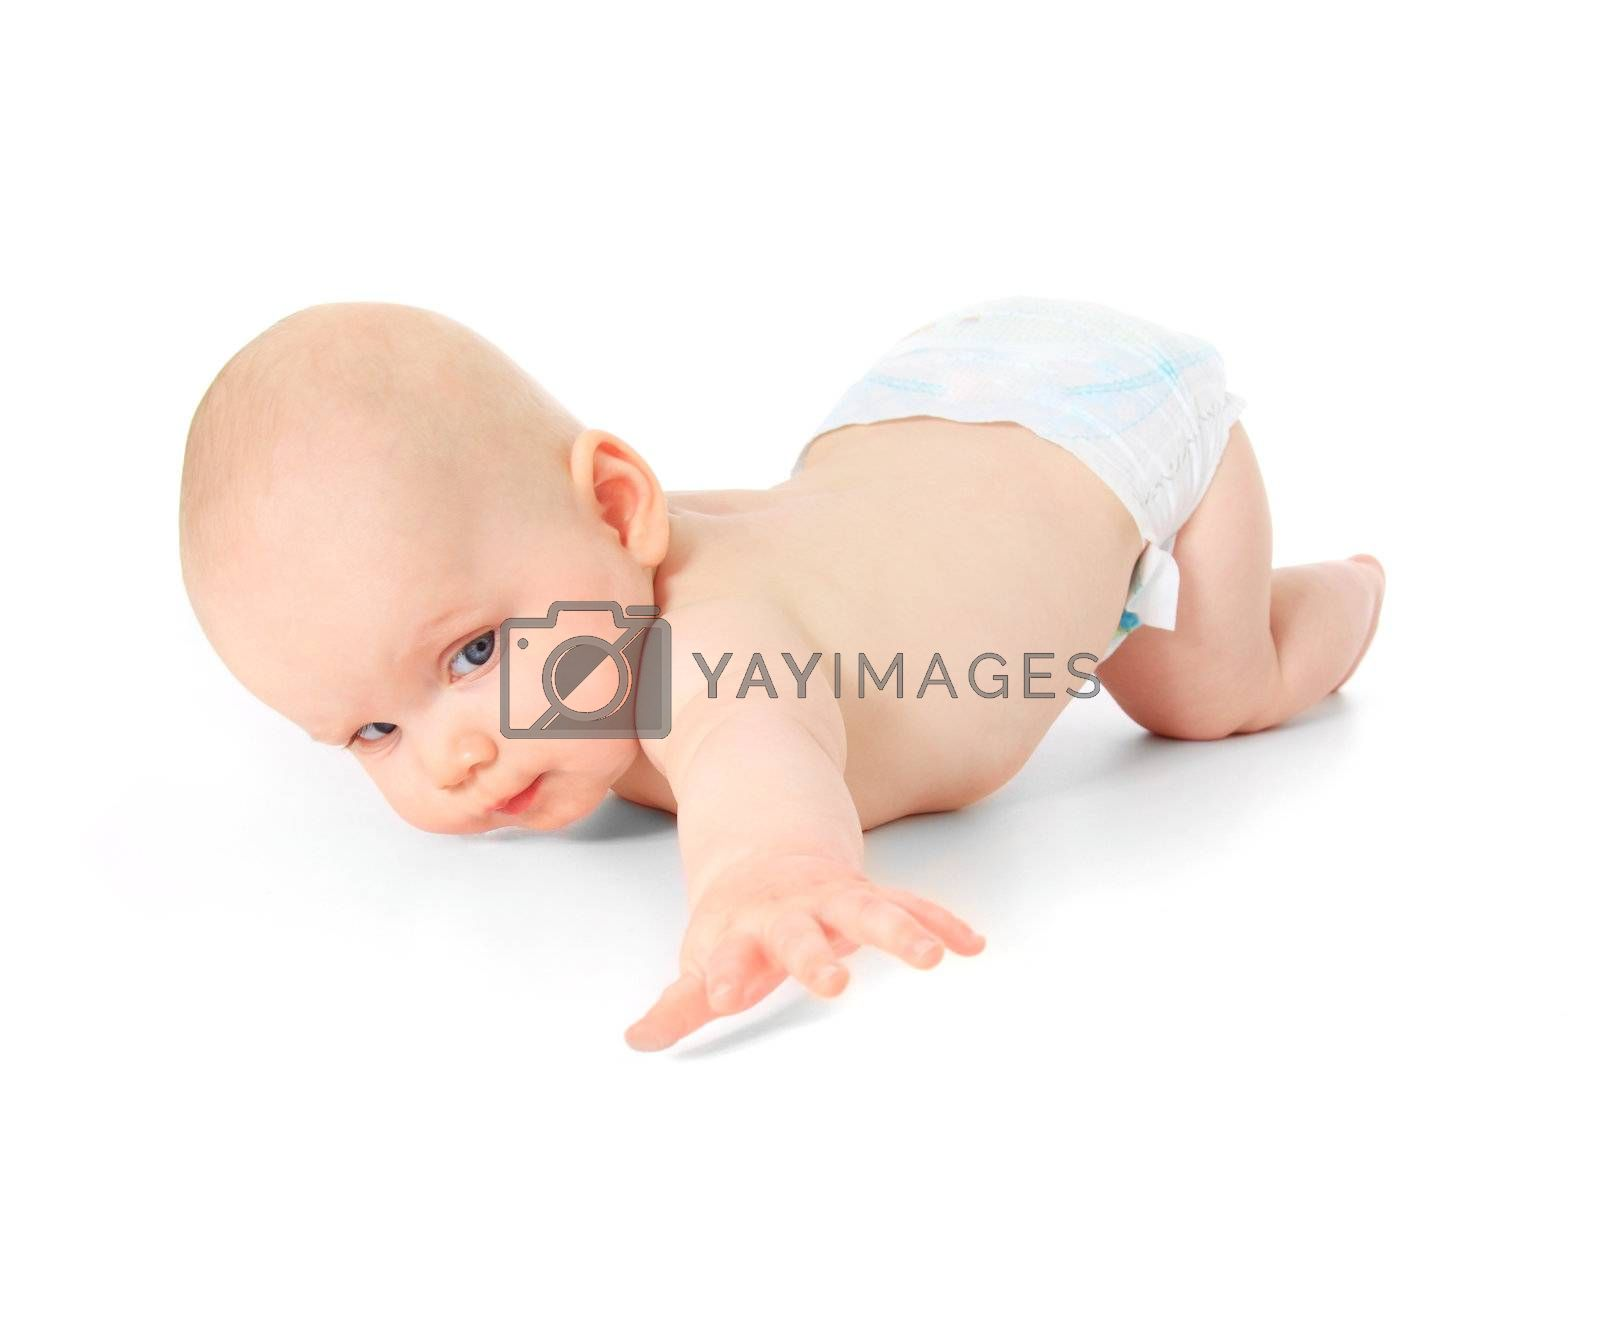 Baby by kaarsten